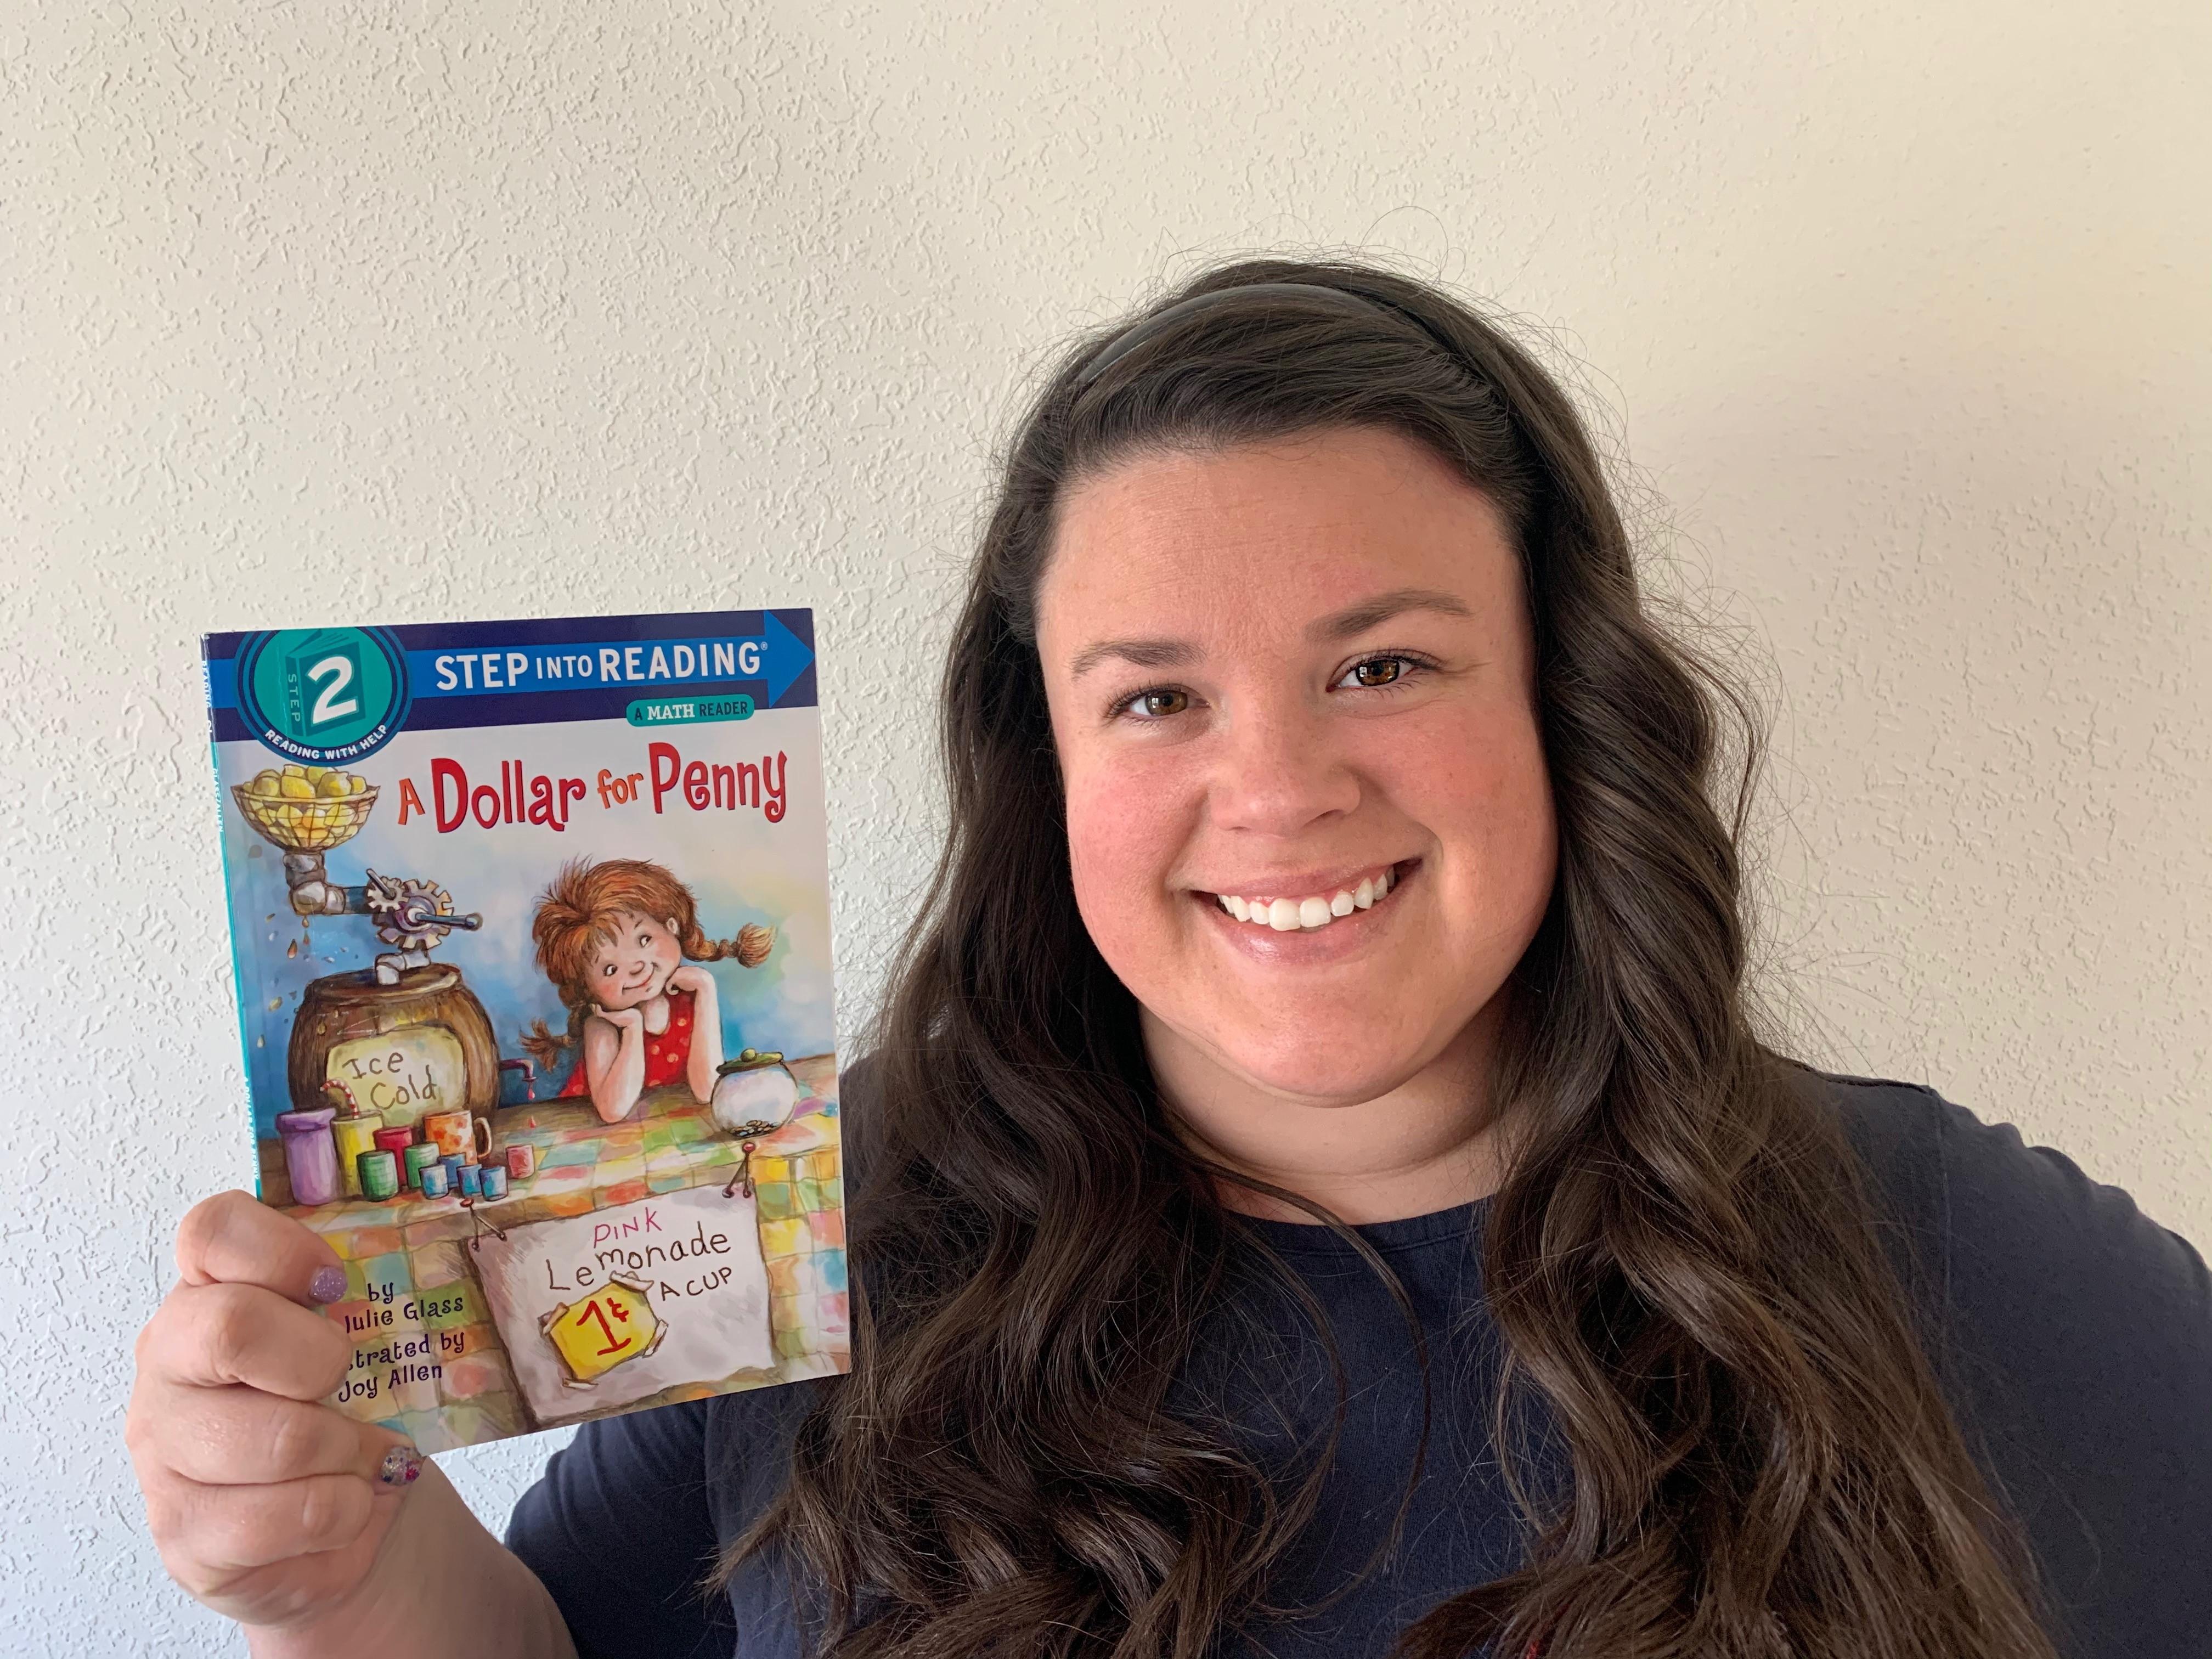 Smart Money Book Reading A Dollar for Penny - Erin Hagedorn